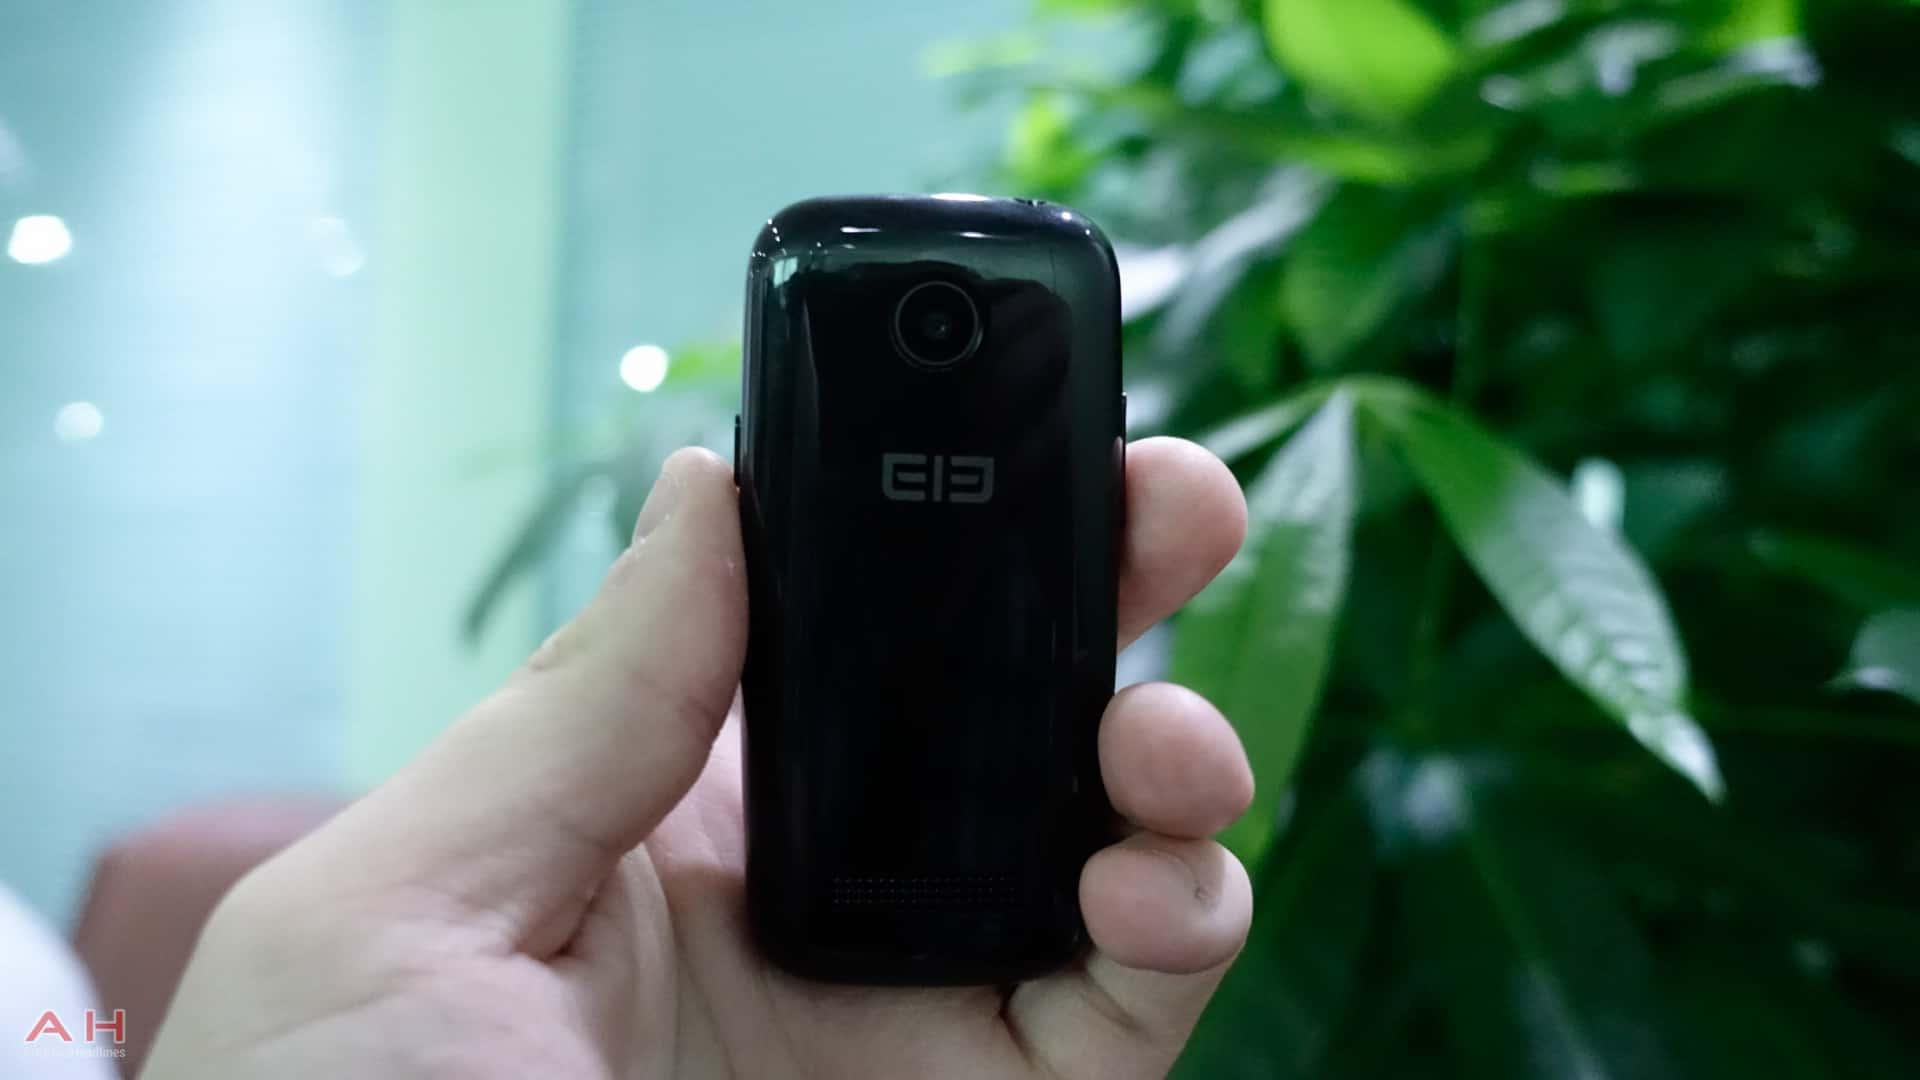 Elephone tiny phone AH 6